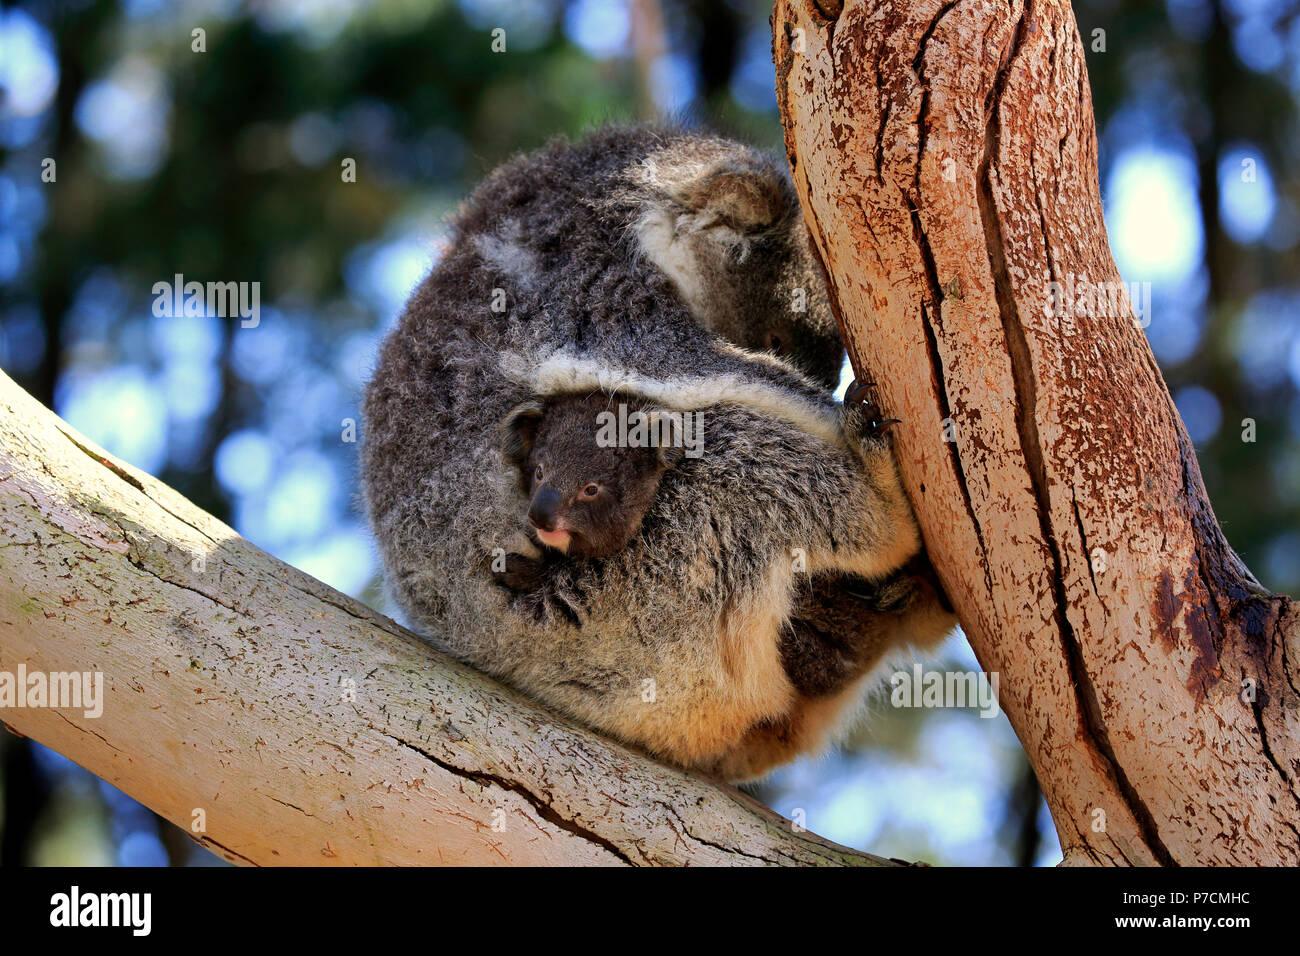 Koala, adult with young on tree, Kangaroo Island, South Australia, Australia, (Phascolarctos cinereus) - Stock Image